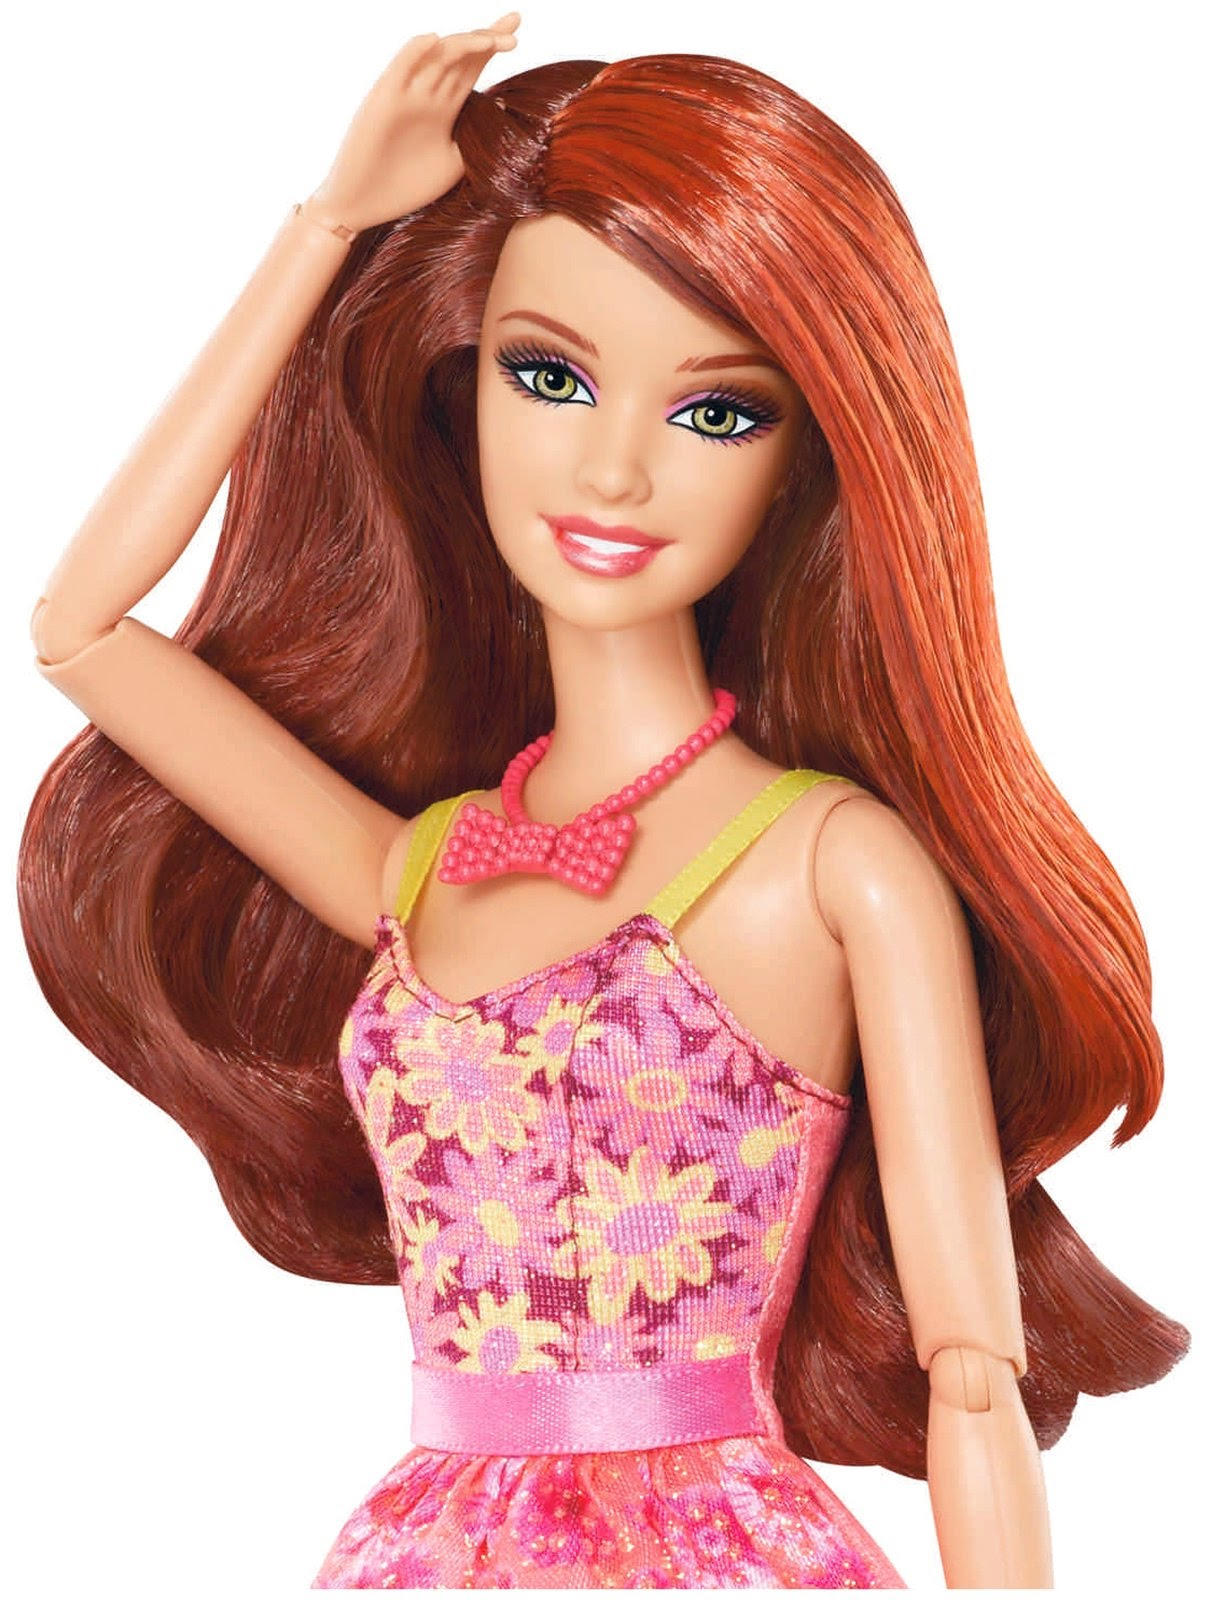 Barbie doll fashion hd wallpapers free download lab4photo - Barbie doll wallpaper free download ...